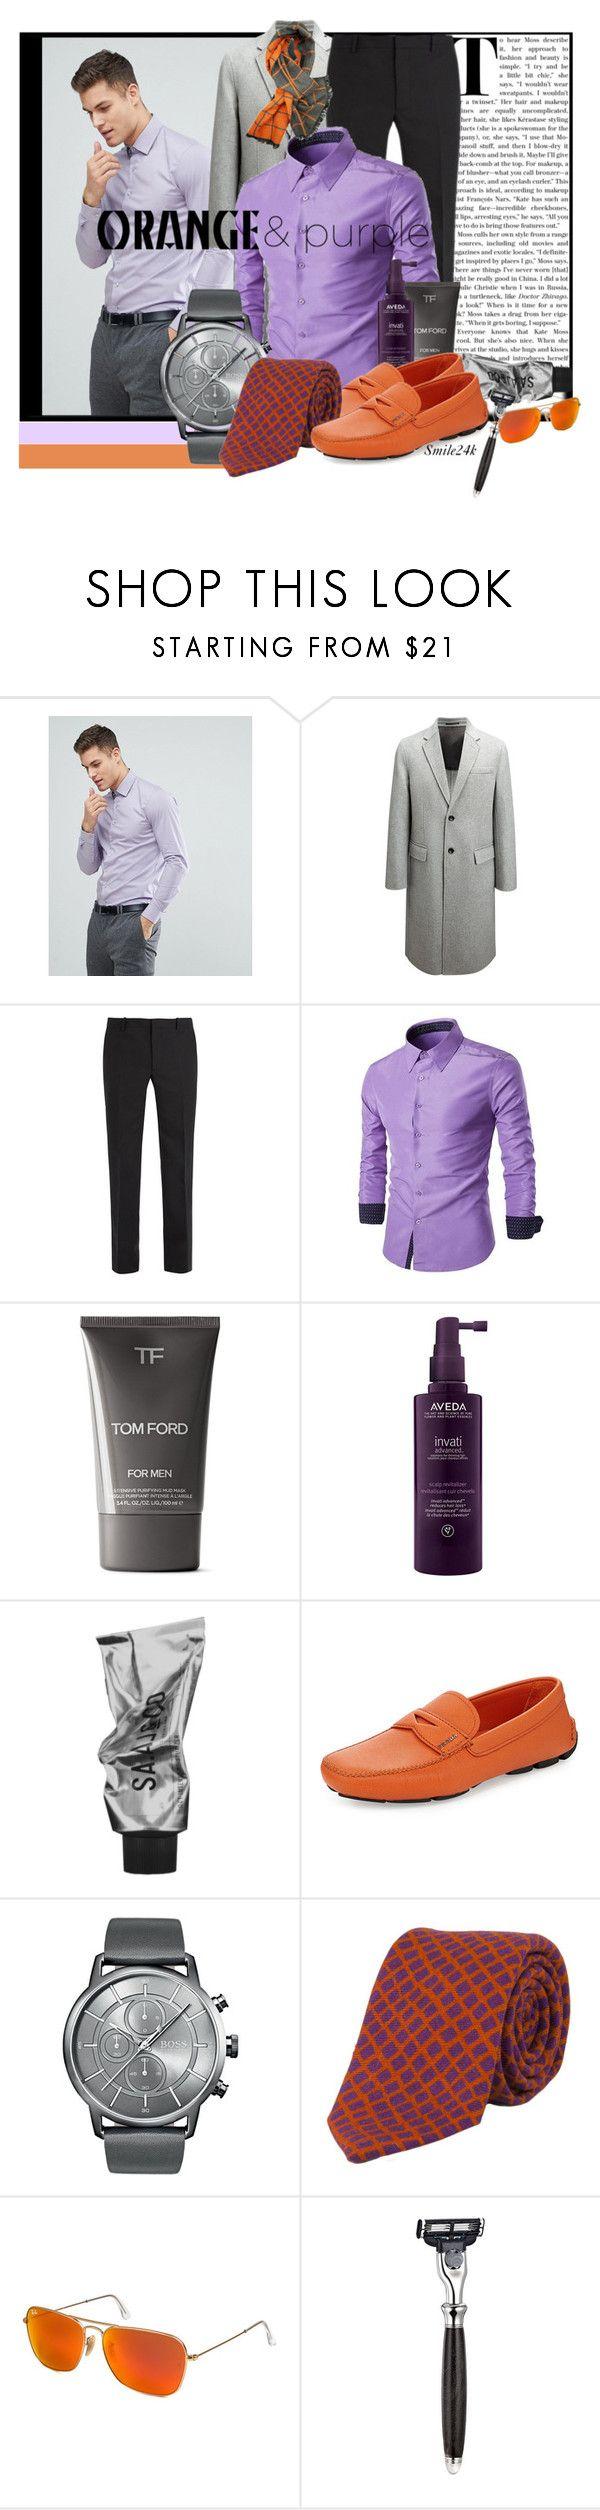 """Orange & Purple"" by smile24k ❤ liked on Polyvore featuring Calvin Klein, Joseph, Balenciaga, Tom Ford, Aveda, Prada, BOSS Hugo Boss, 40 Colori, Ray-Ban and The Art of Shaving"